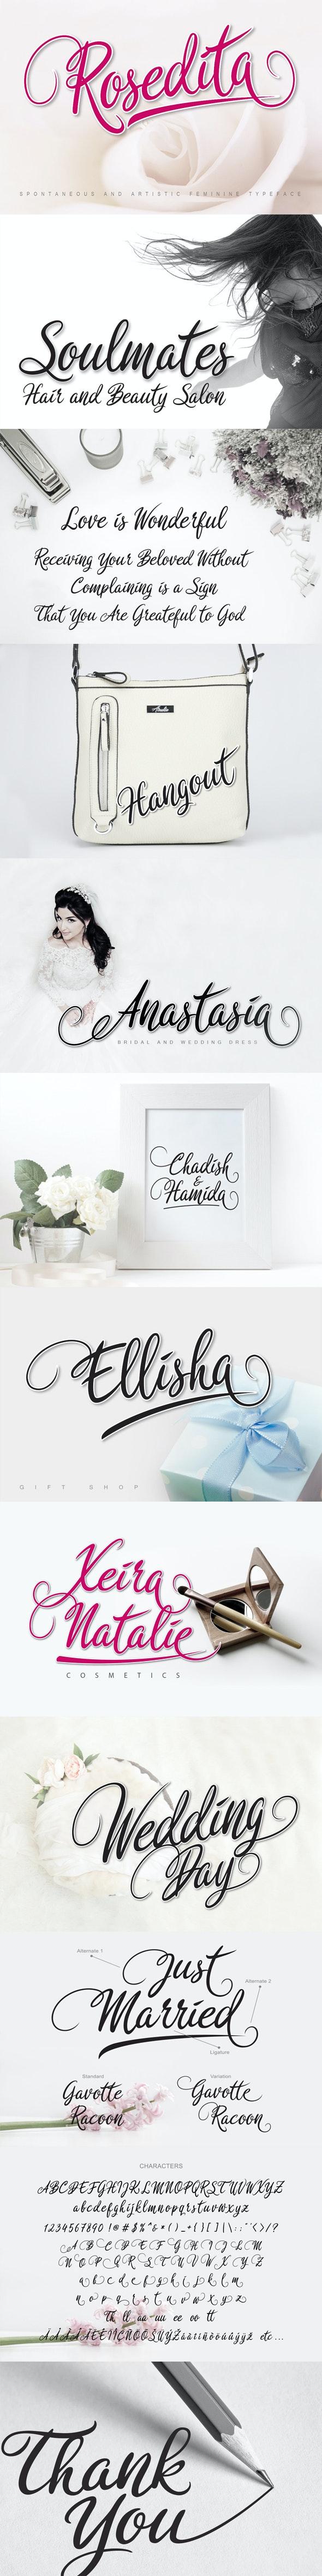 Rosedita Script - Calligraphy Script